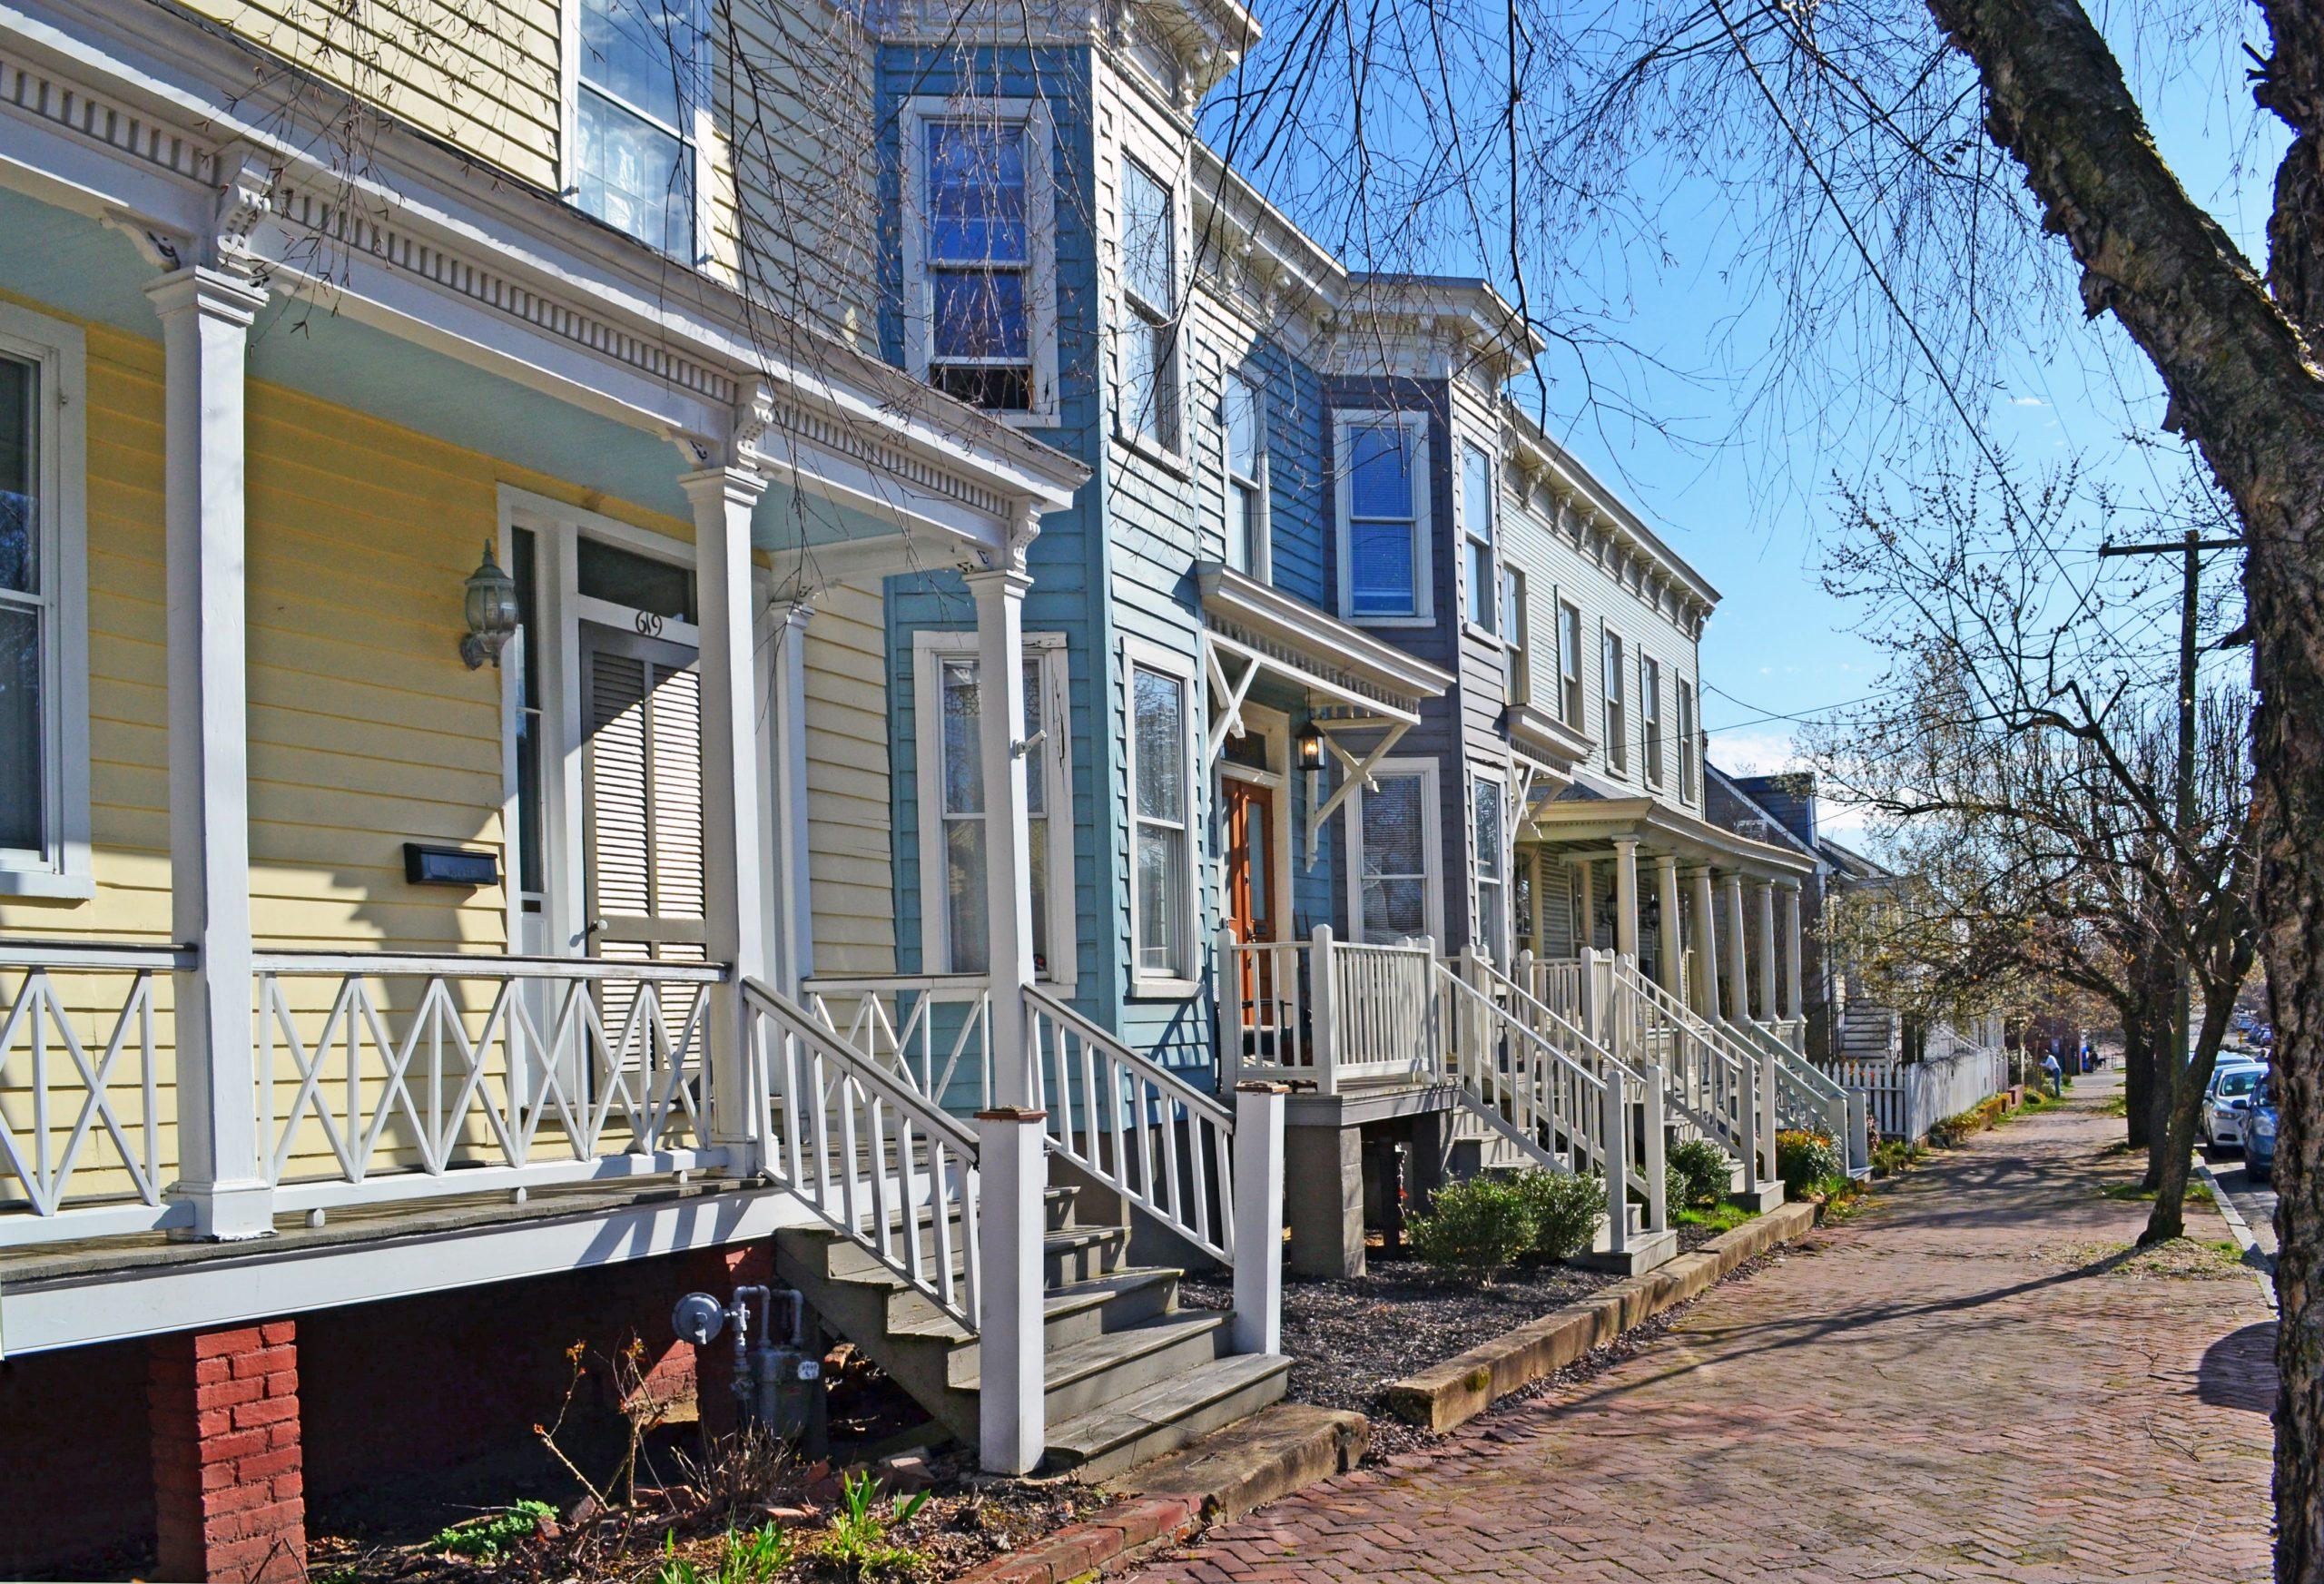 Union Hill Historic District